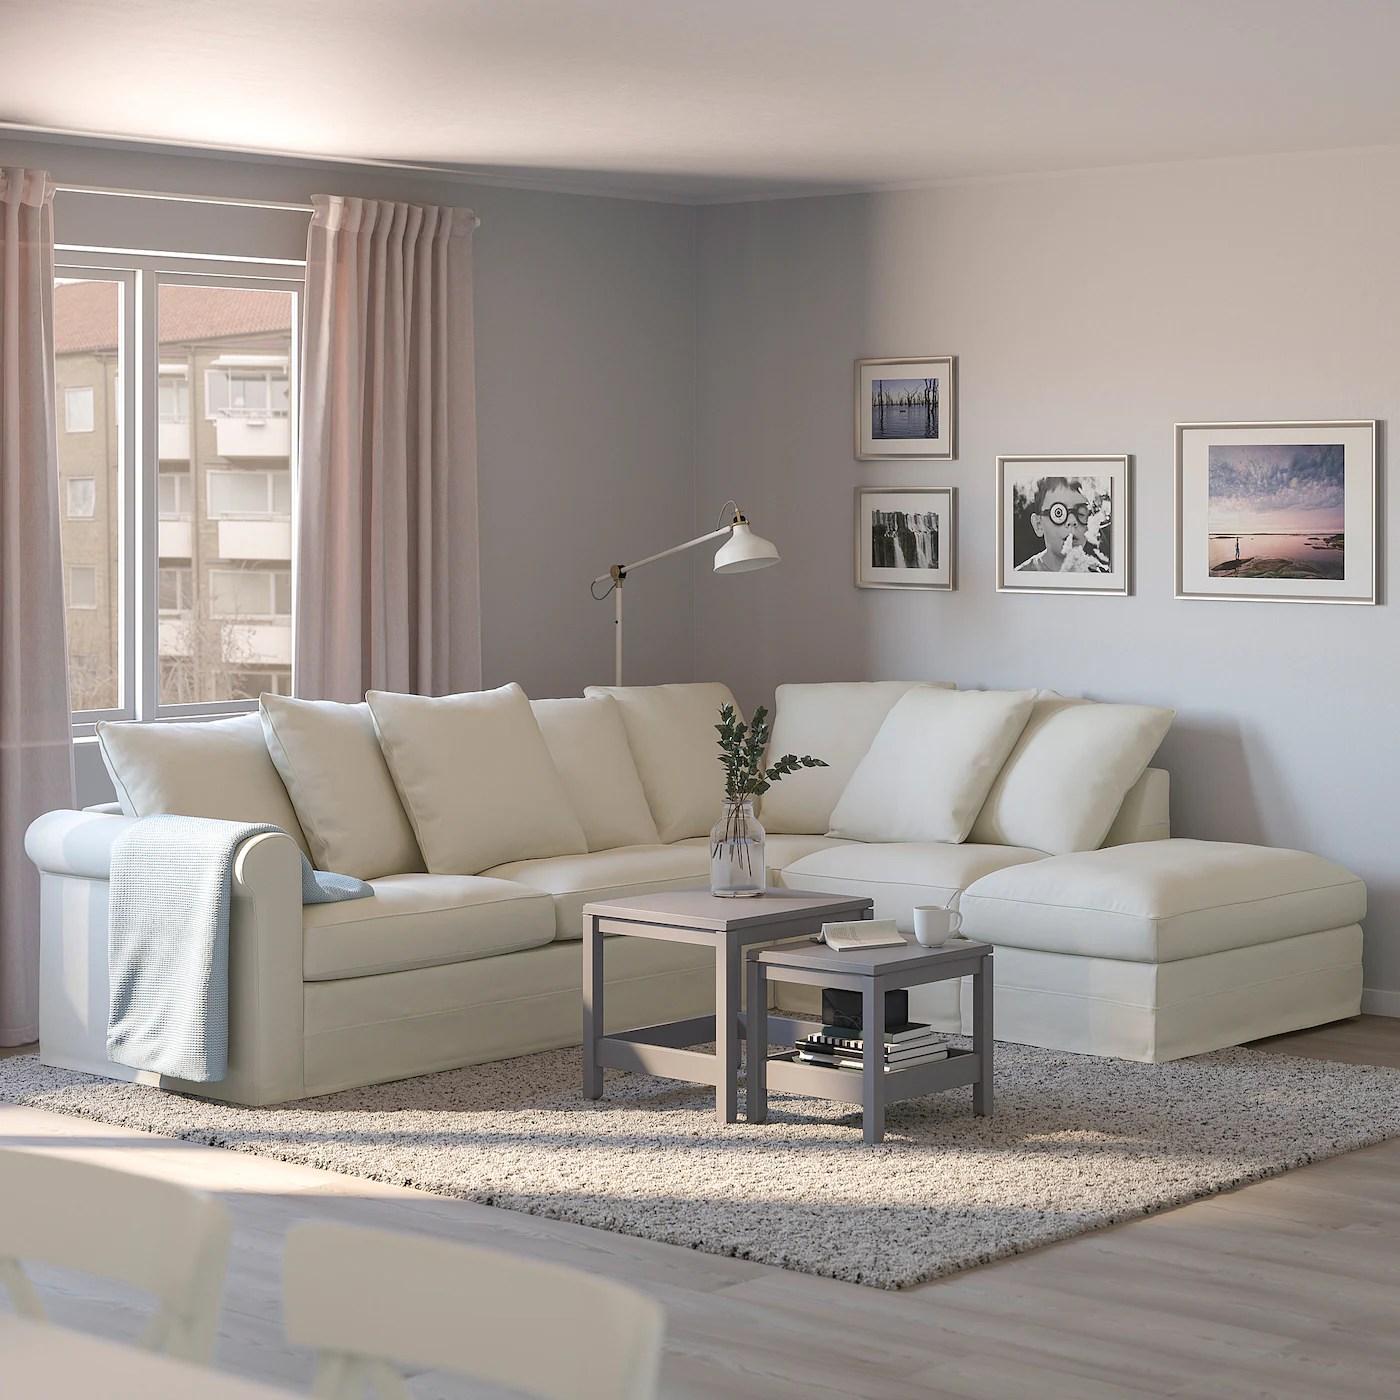 vindum tapis poils hauts blanc 200x270 cm